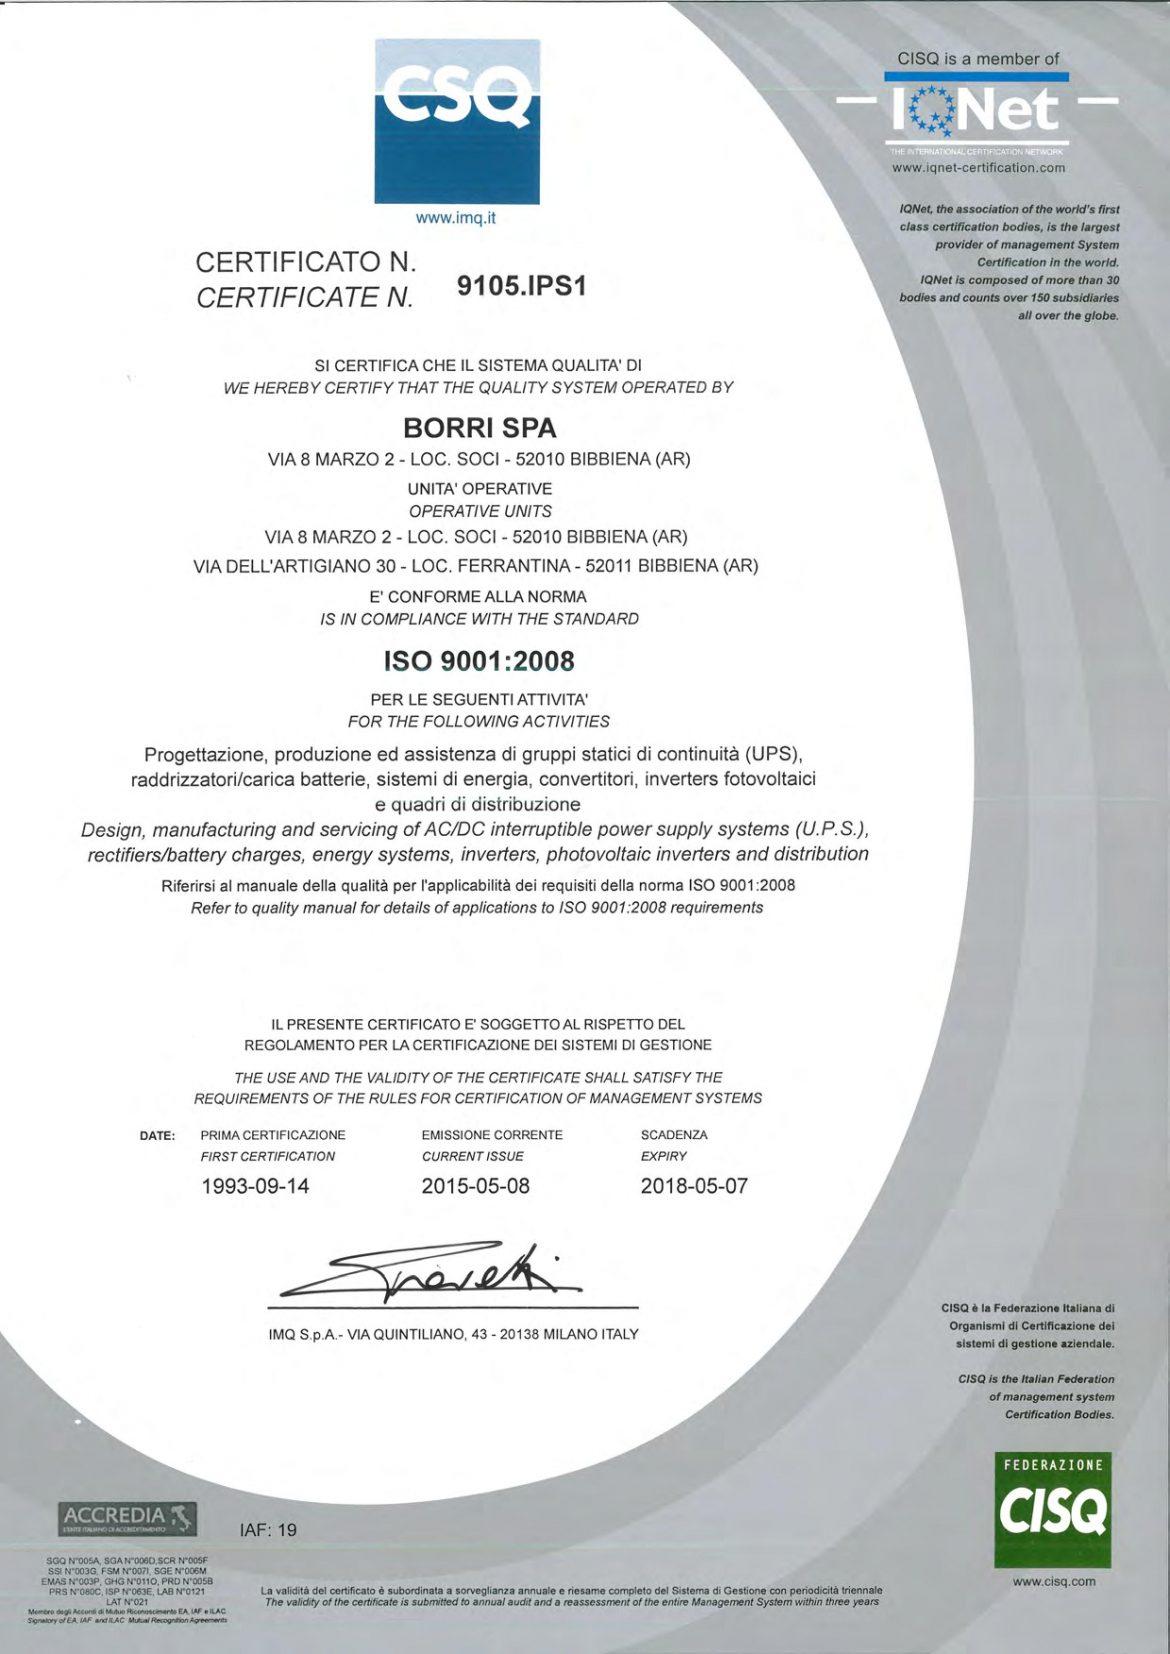 Ейч Ай Инженеринг ISO 9001:2008 Borri